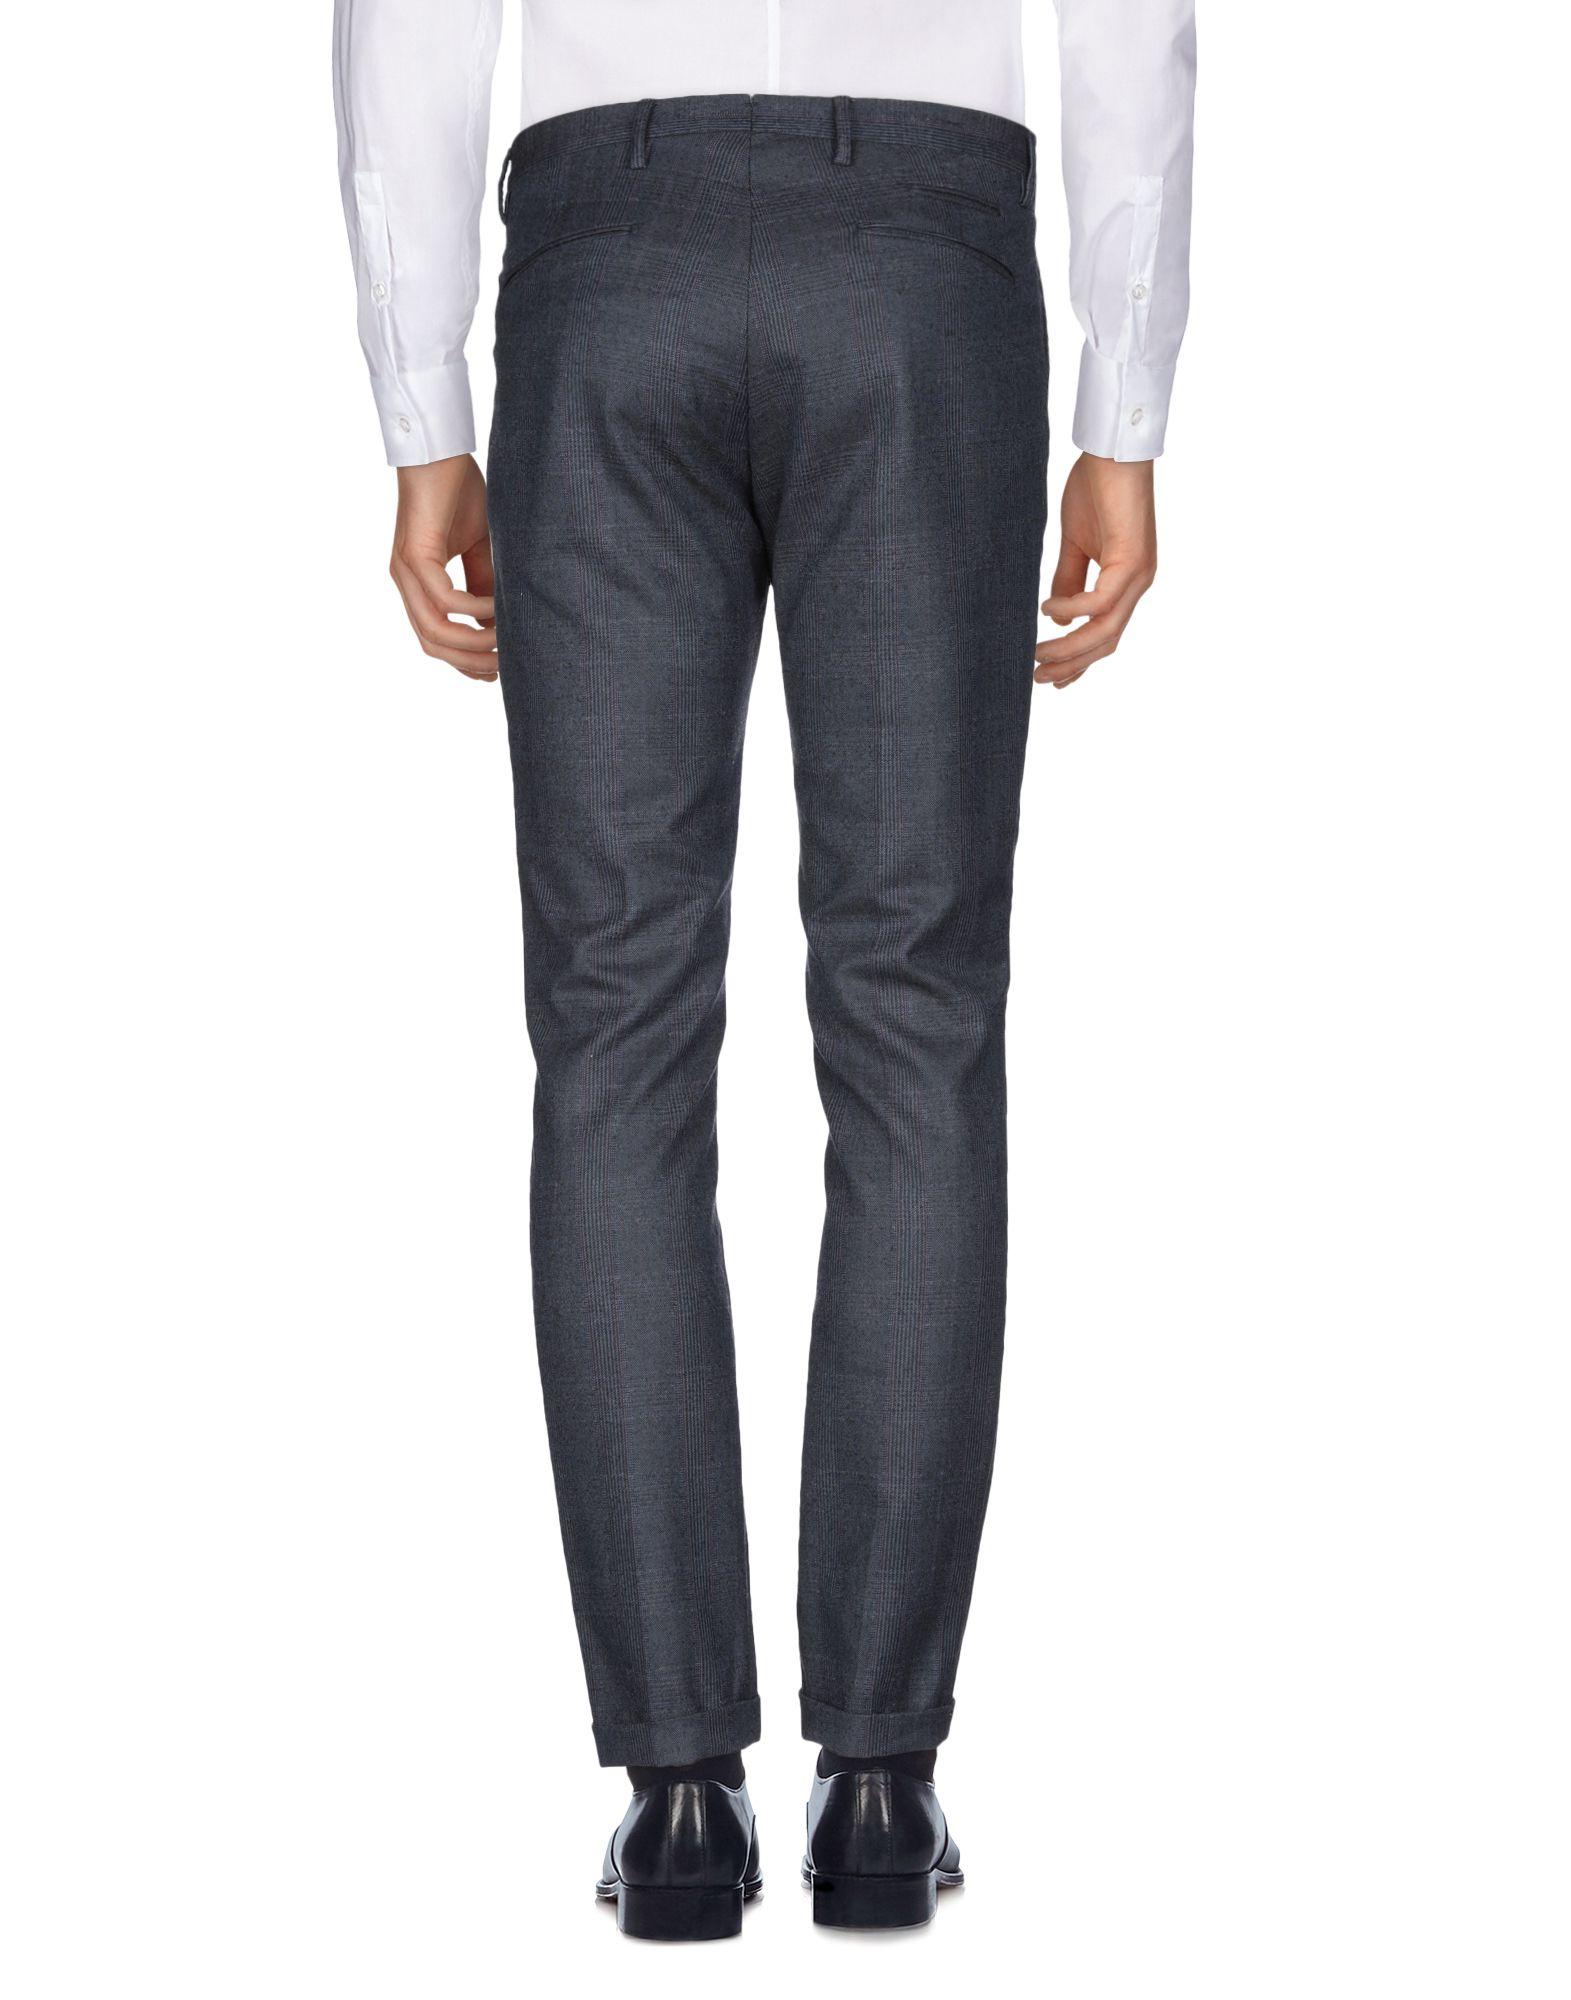 Pantalone Briglia 1949 - Uomo - 1949 13217835AR e89a70